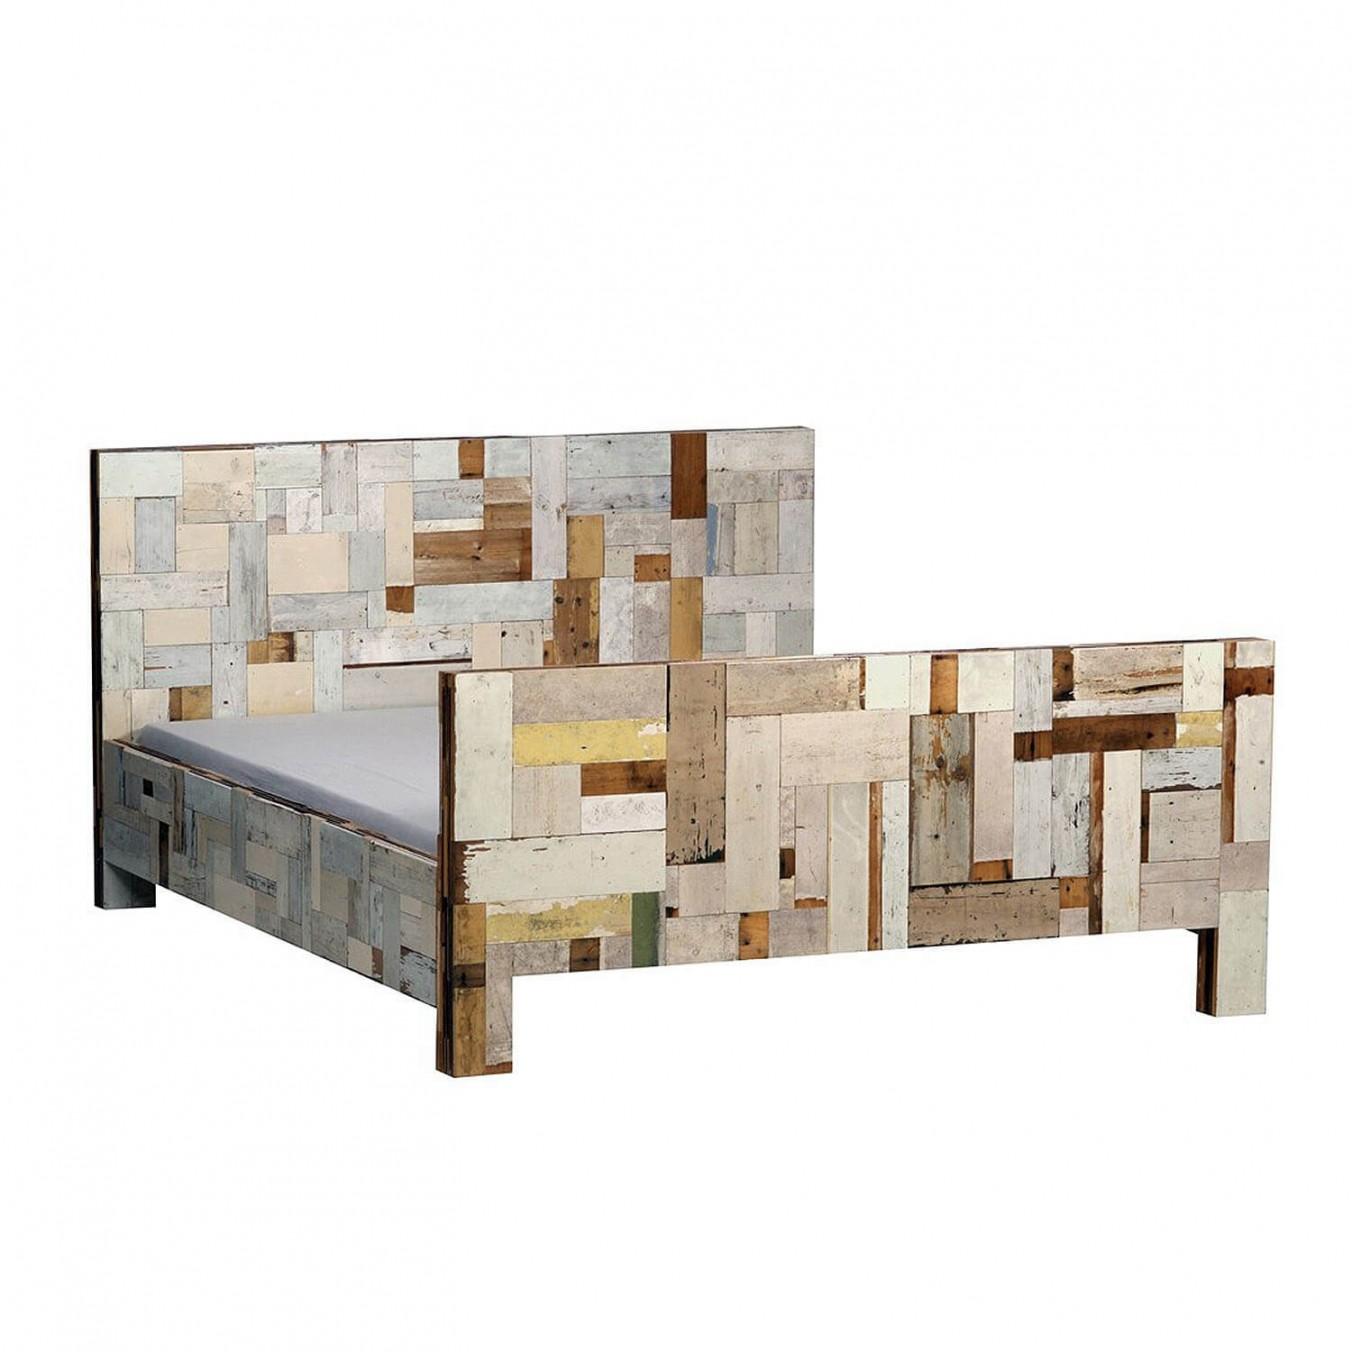 Waste Bed in Scrapwood